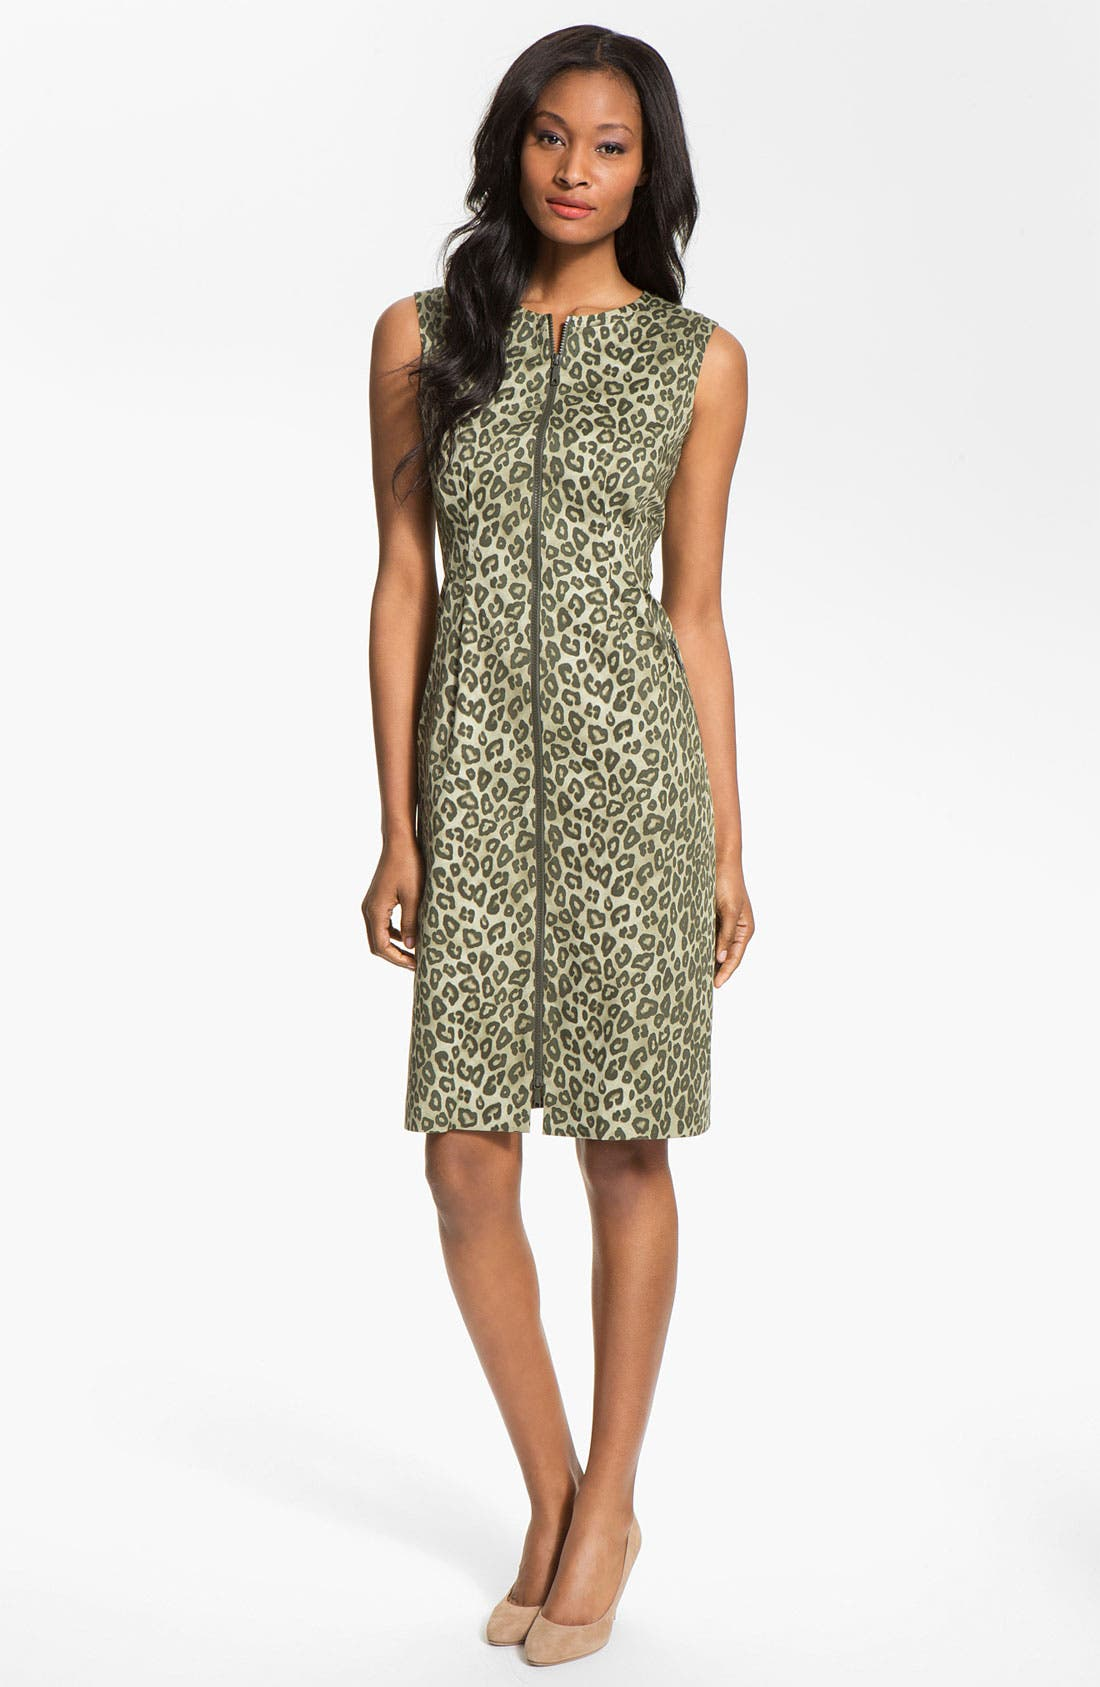 Alternate Image 1 Selected - Lafayette 148 New York 'Misti - Senegal Cheetah' Dress